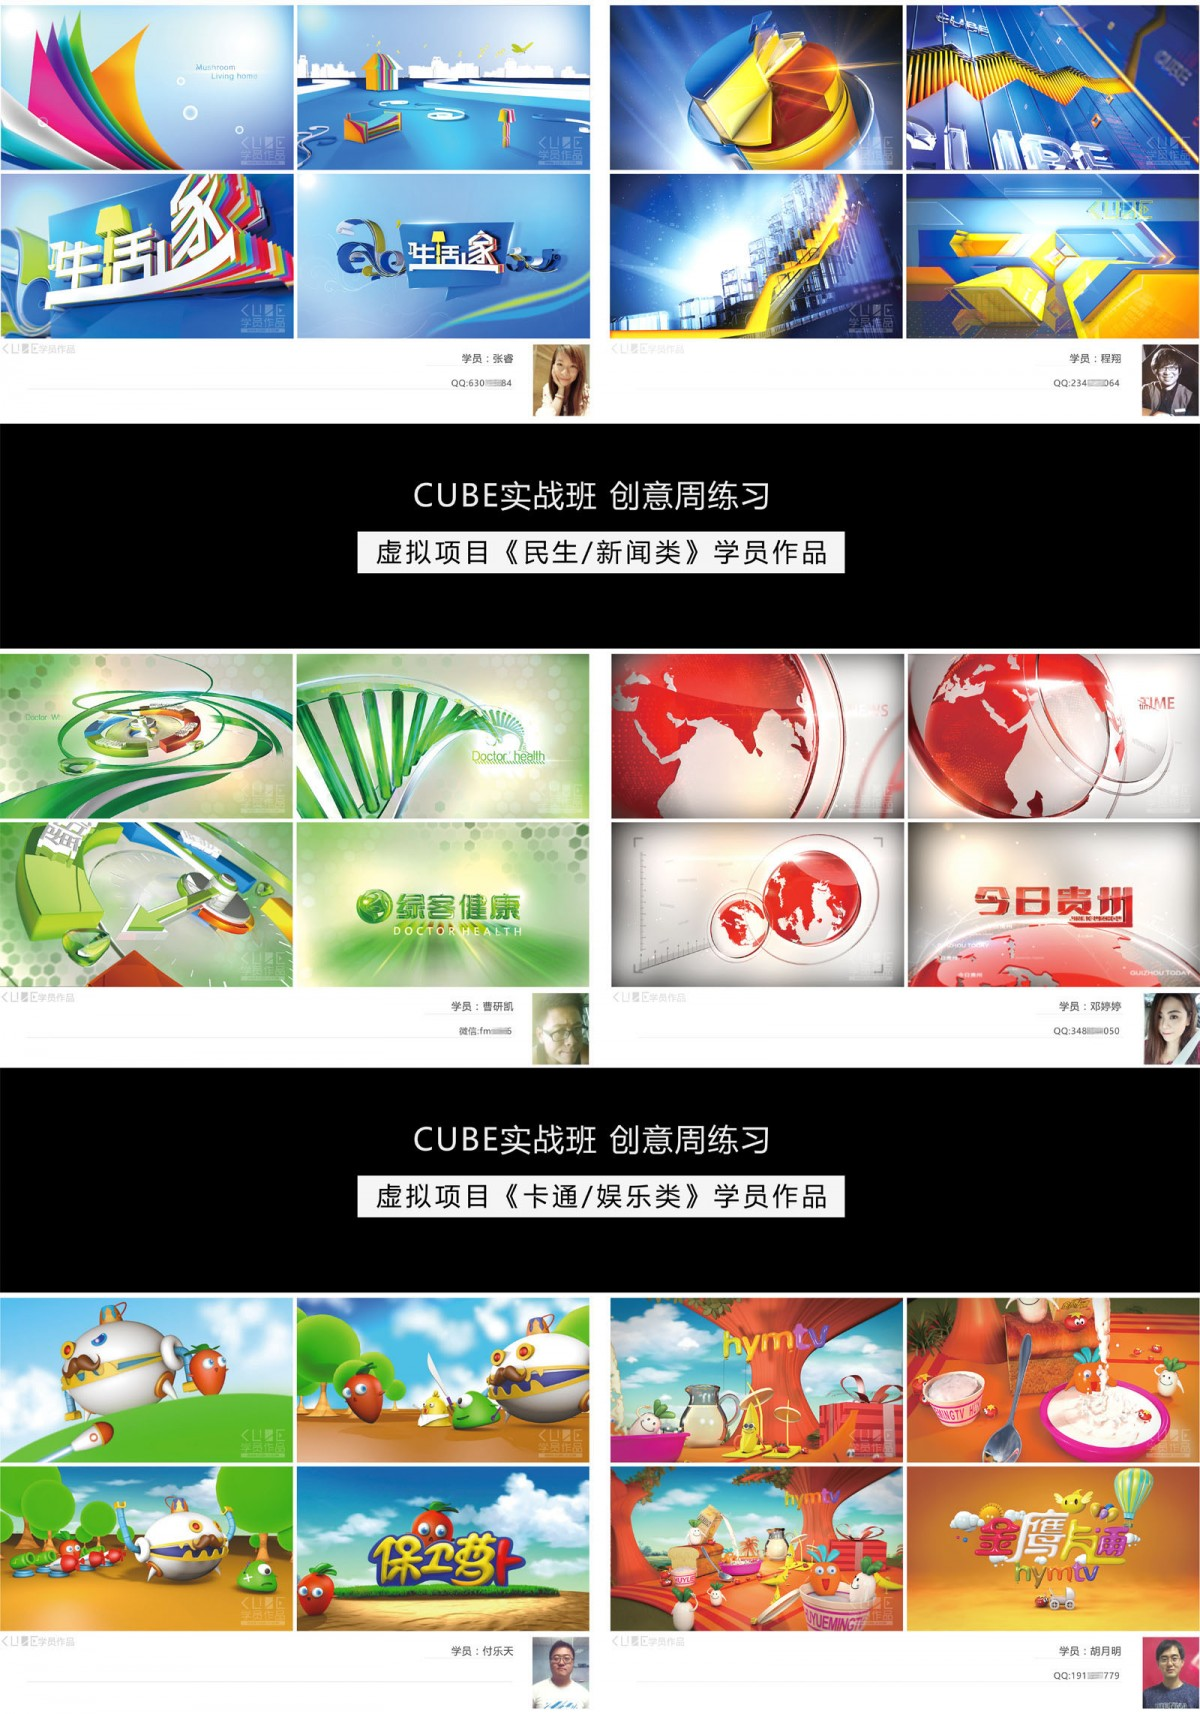 CUBE实战班 创意周——《文化/新闻/民生/综艺类》 虚拟项目练习